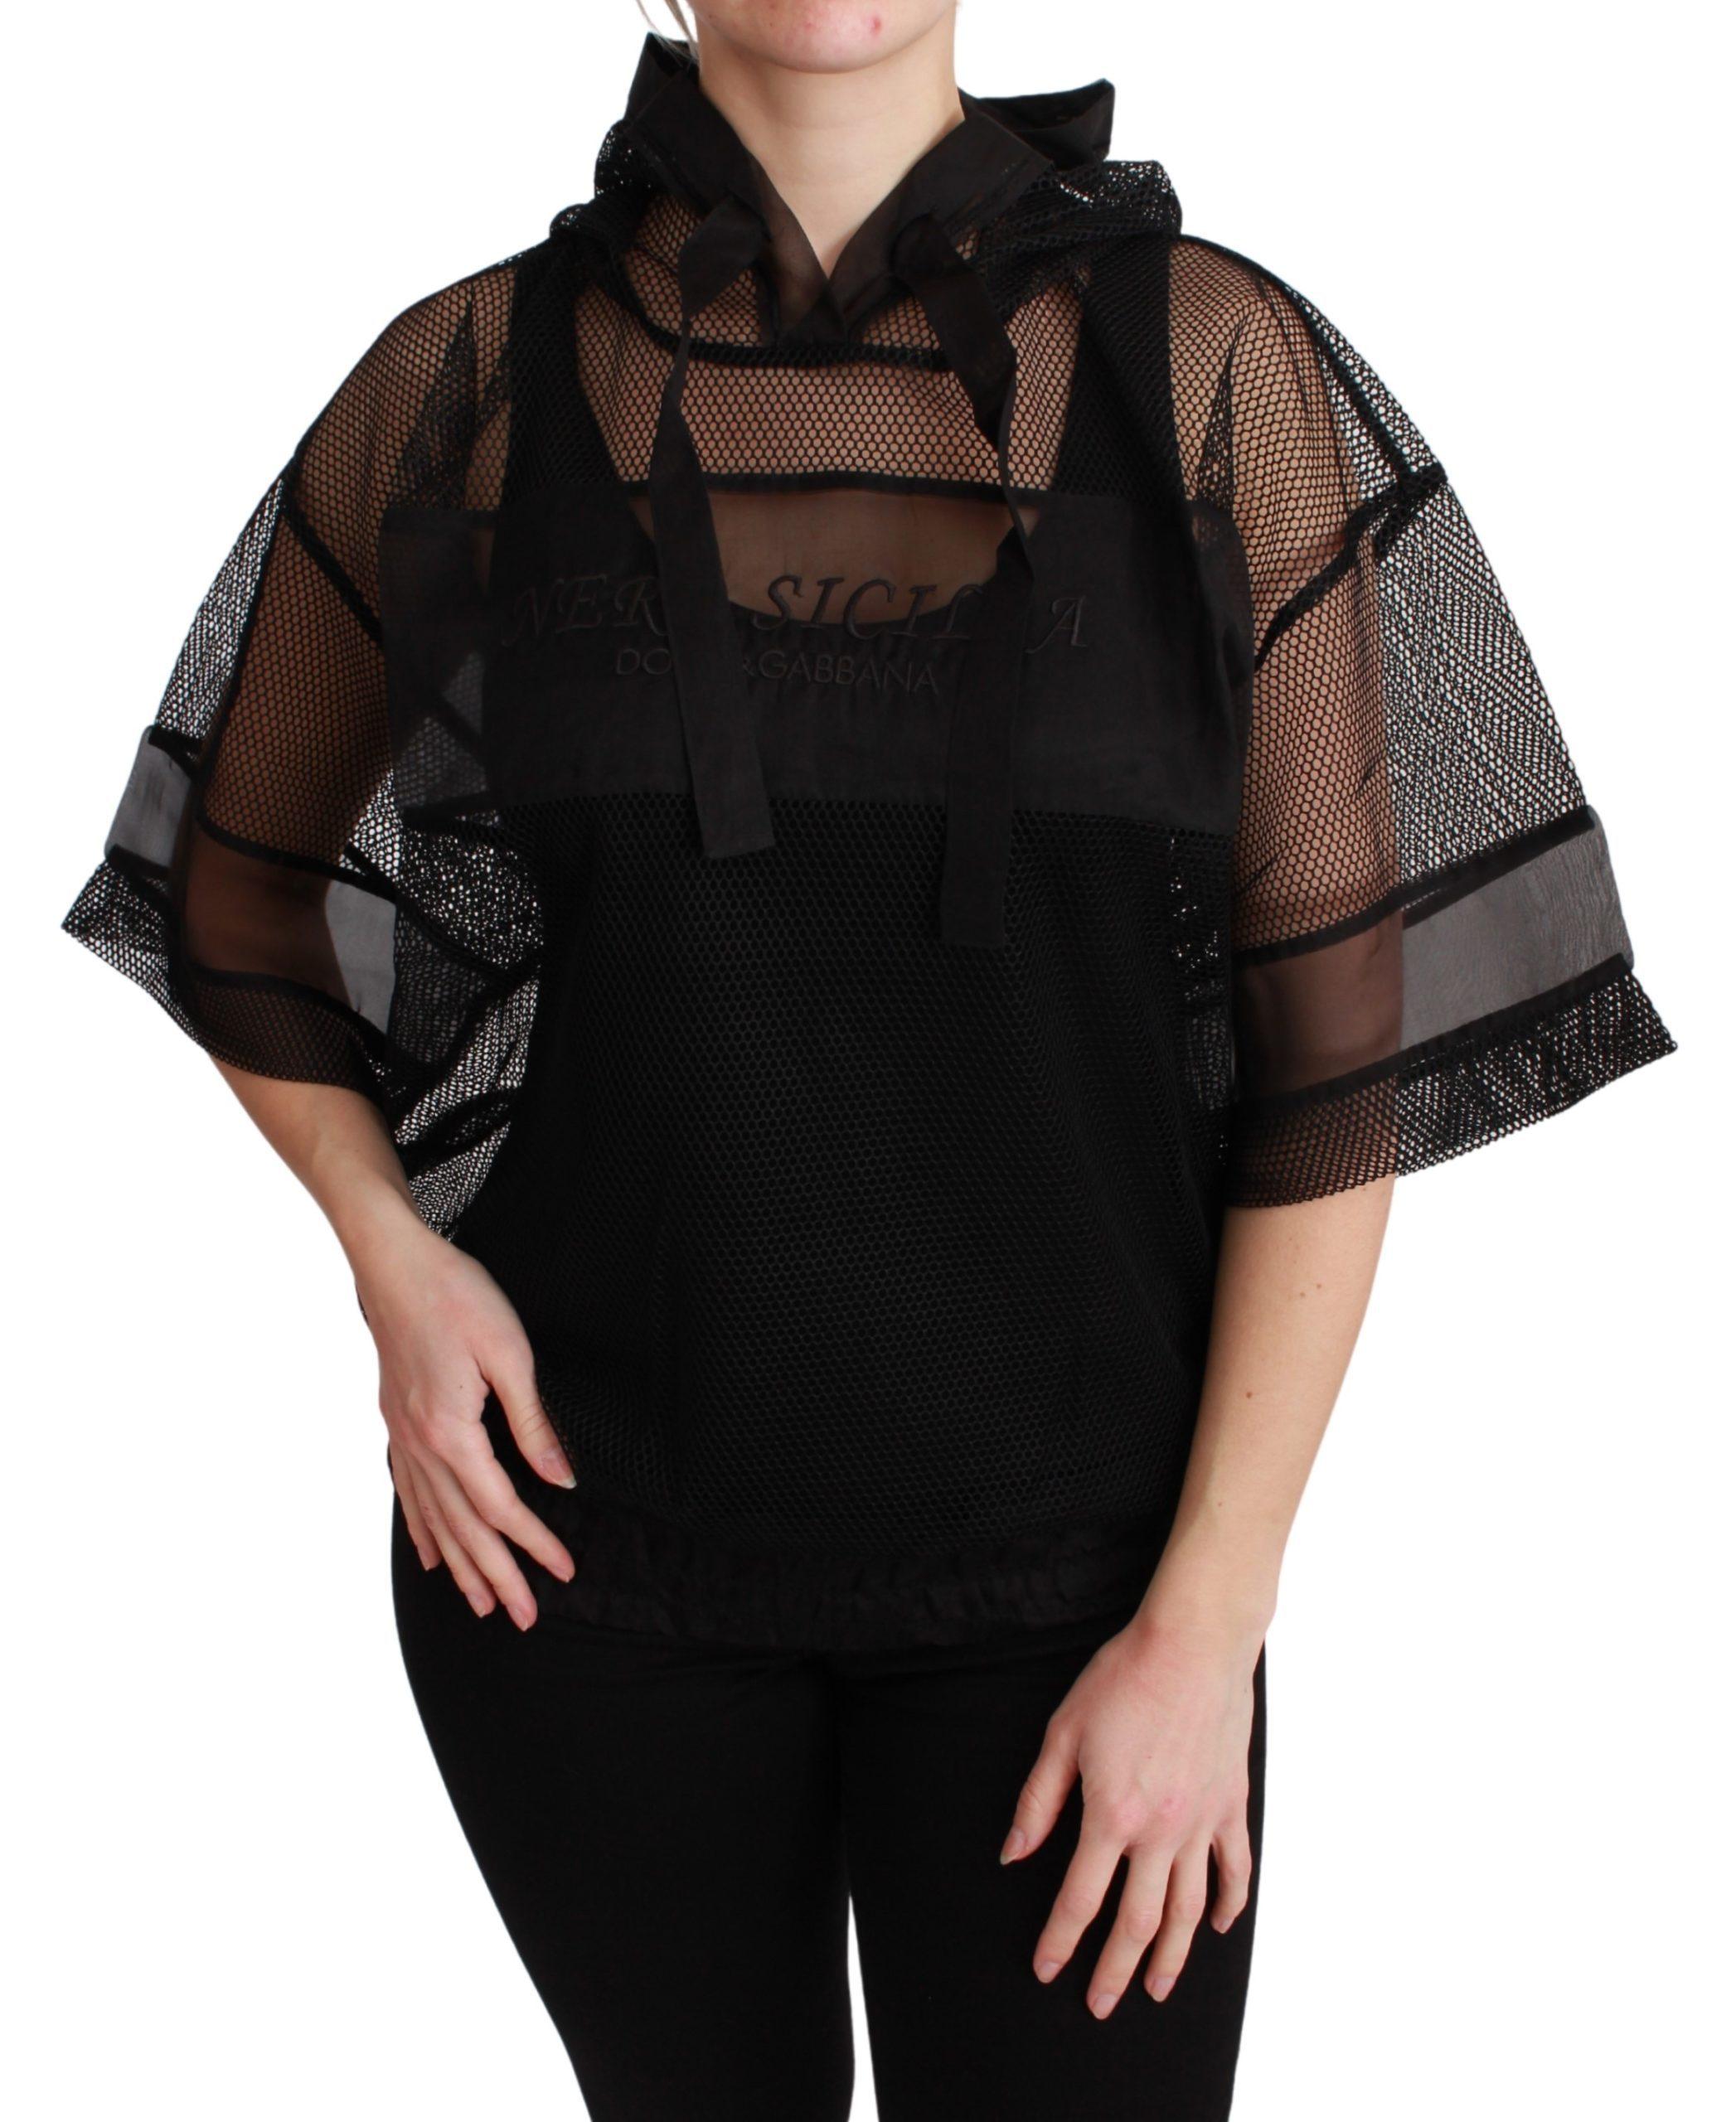 Dolce & Gabbana Women's Sheer Nero Sicilia T-Shirt Black TSH4573 - IT36 | XS